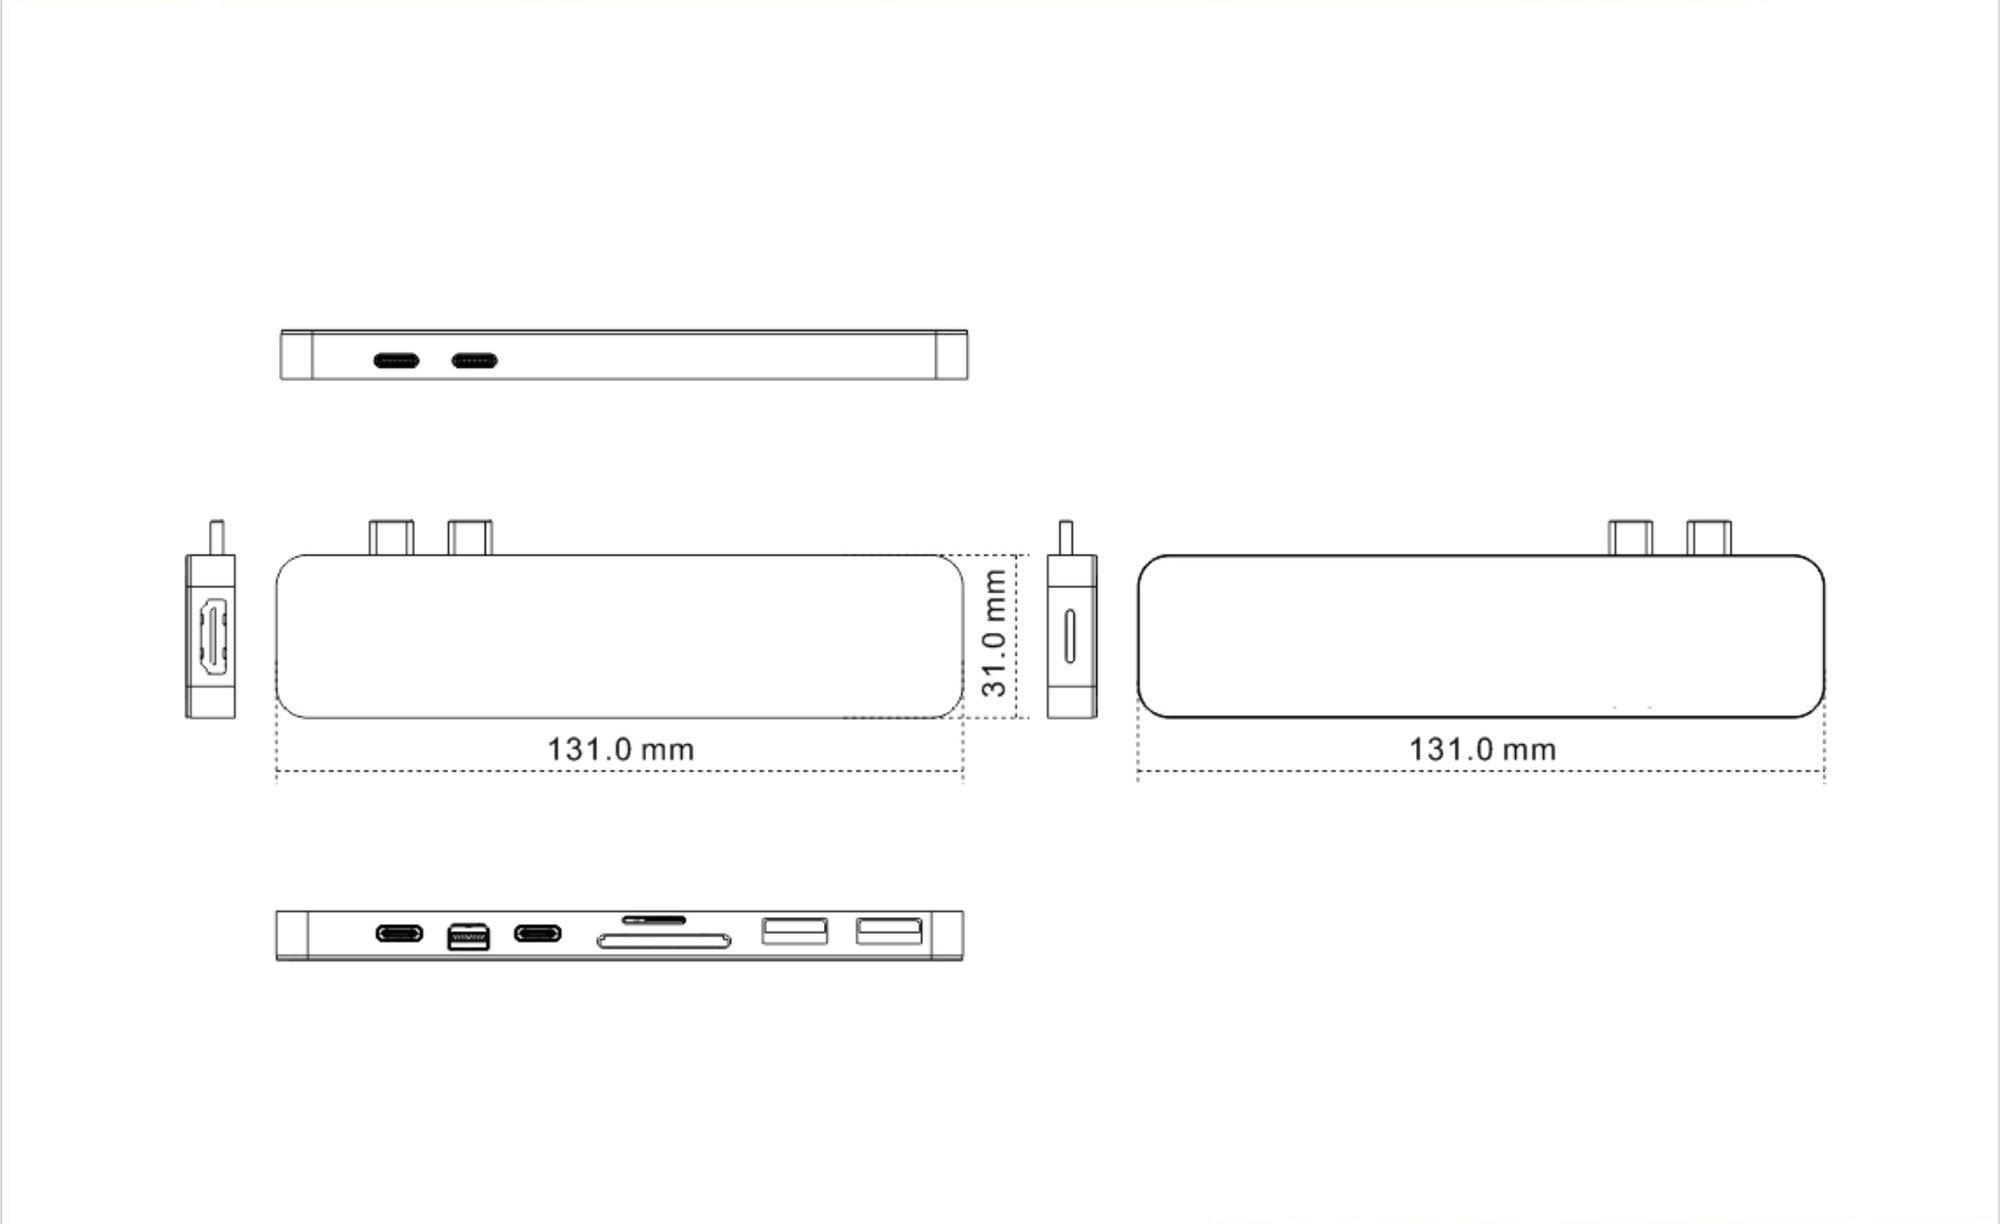 Hyperdrive Wiring Diagram - 2011 Sorento Stereo Wiring Diagram -  dvi-d.yenpancane.jeanjaures37.fr | Hyperdrive Wiring Diagram |  | Wiring Diagram Resource